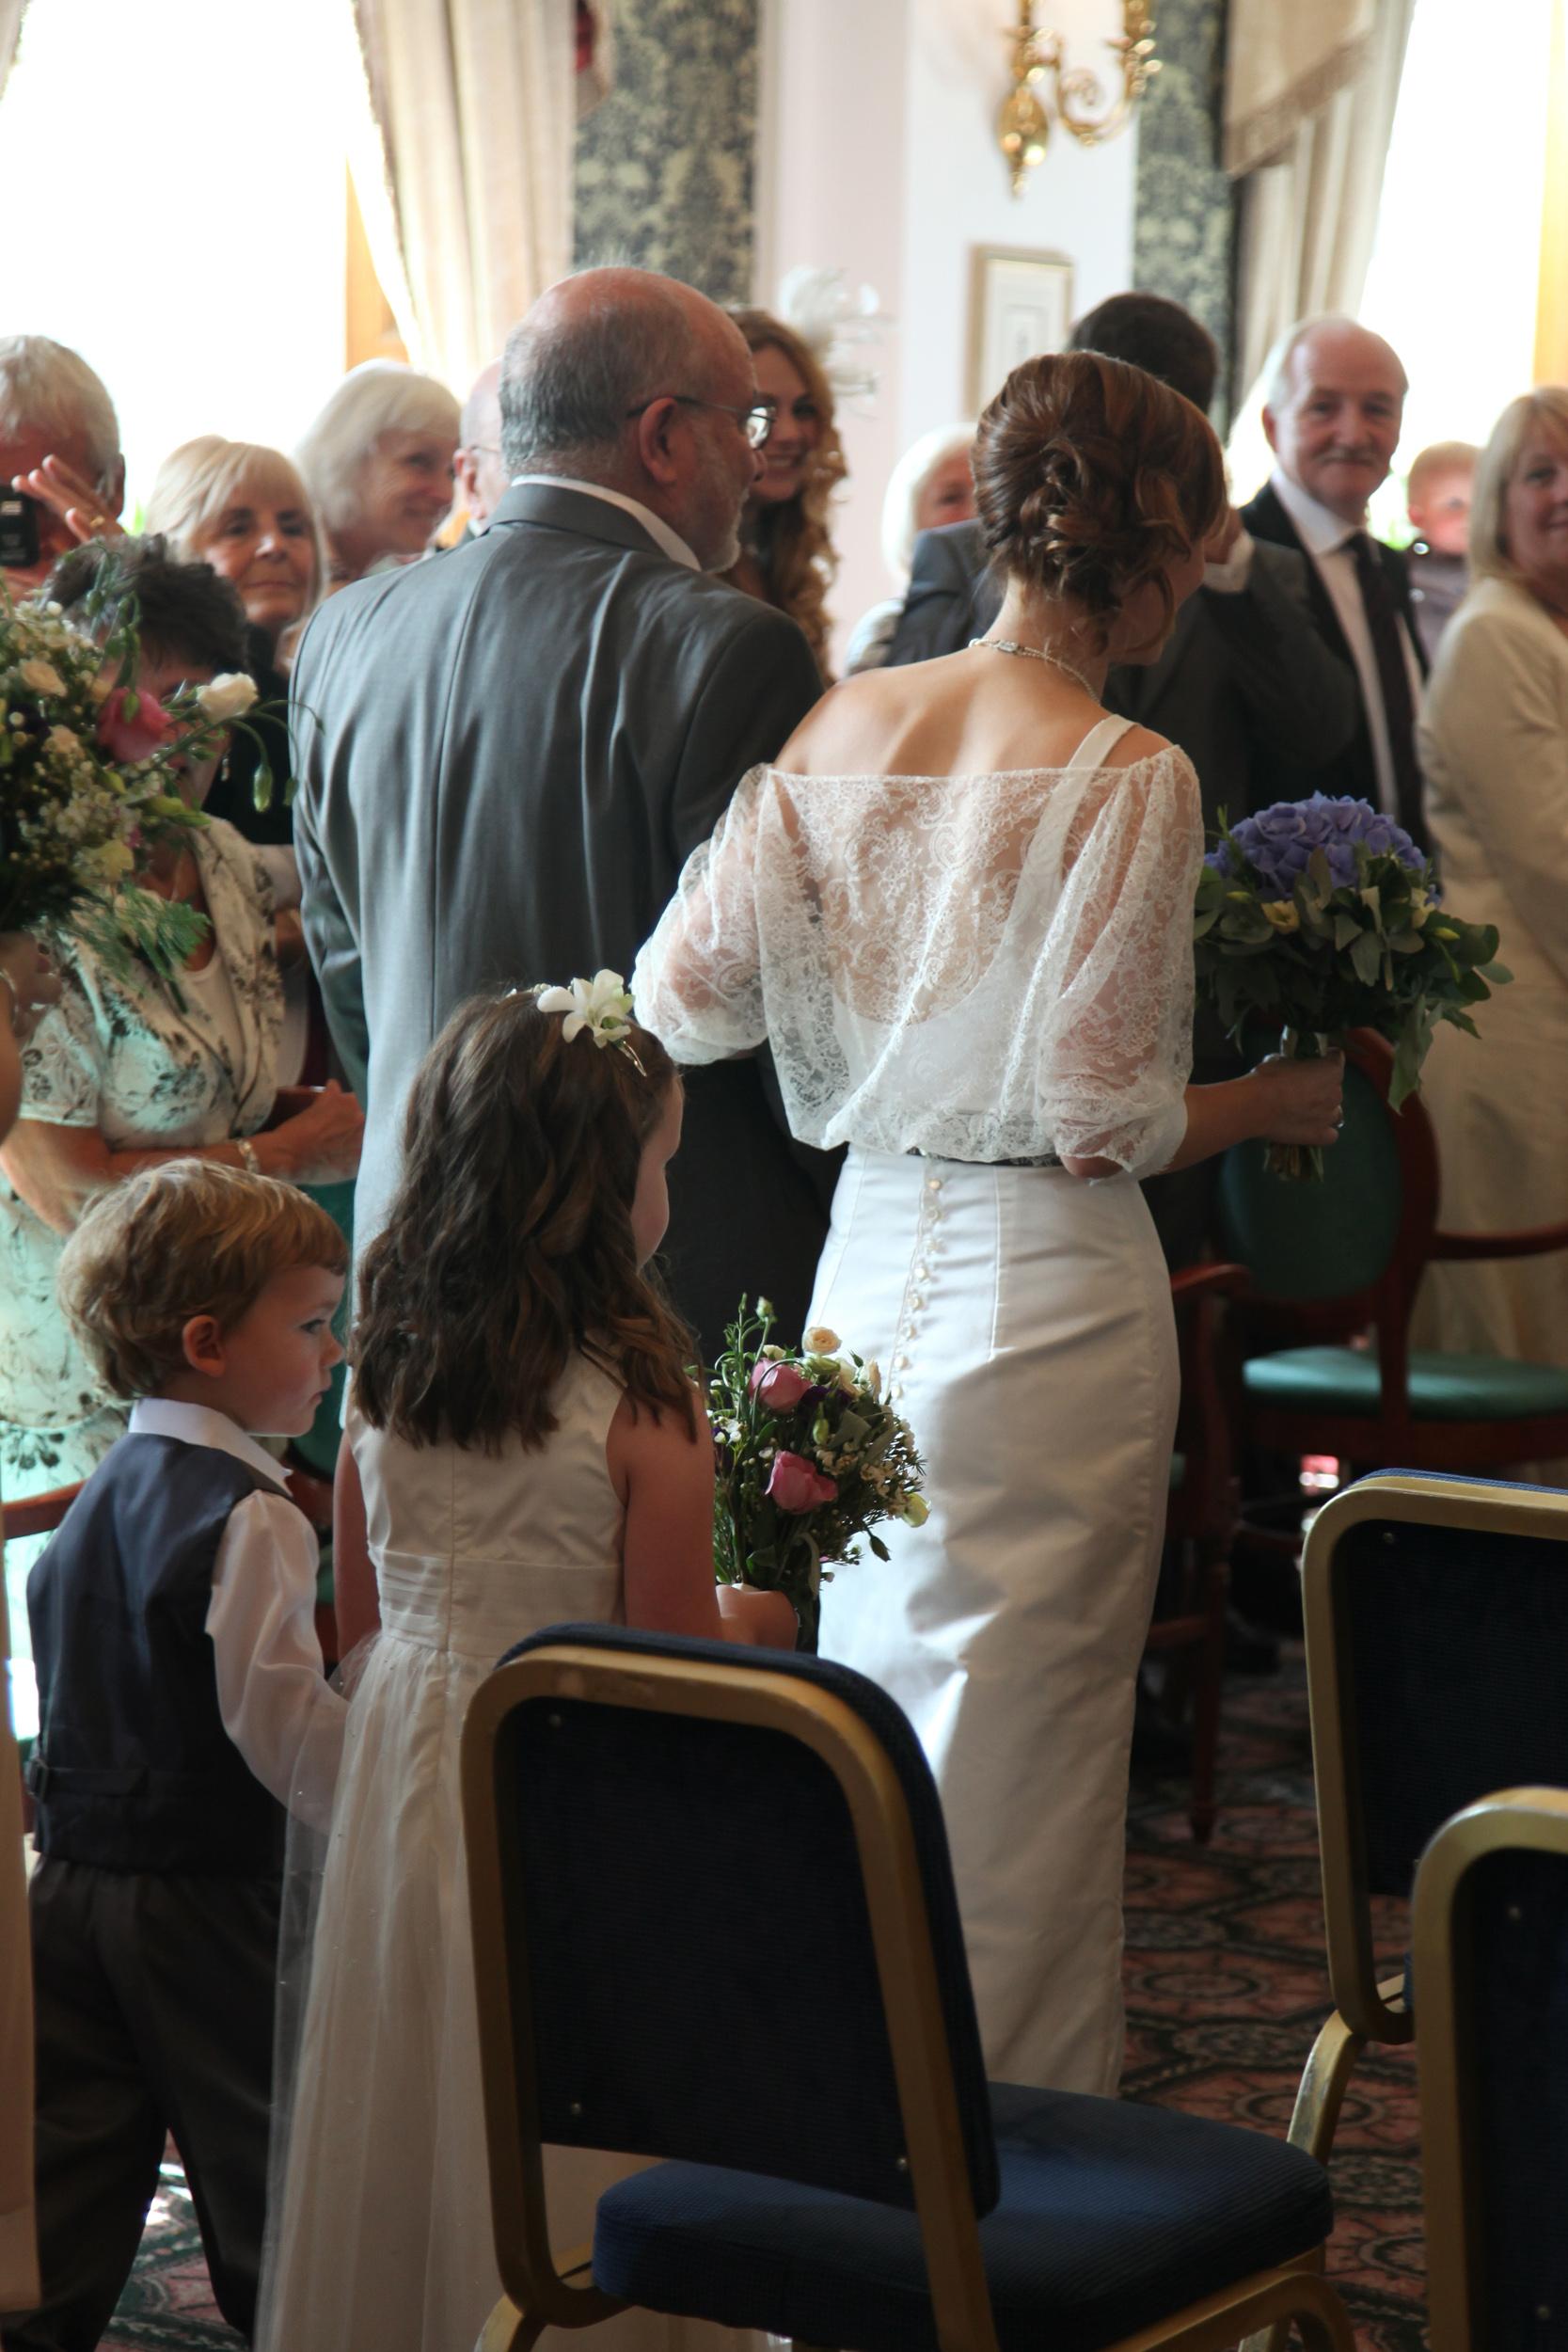 Alexandra-bespoke-wedding-dress-Kate-Beaumont-2.jpg